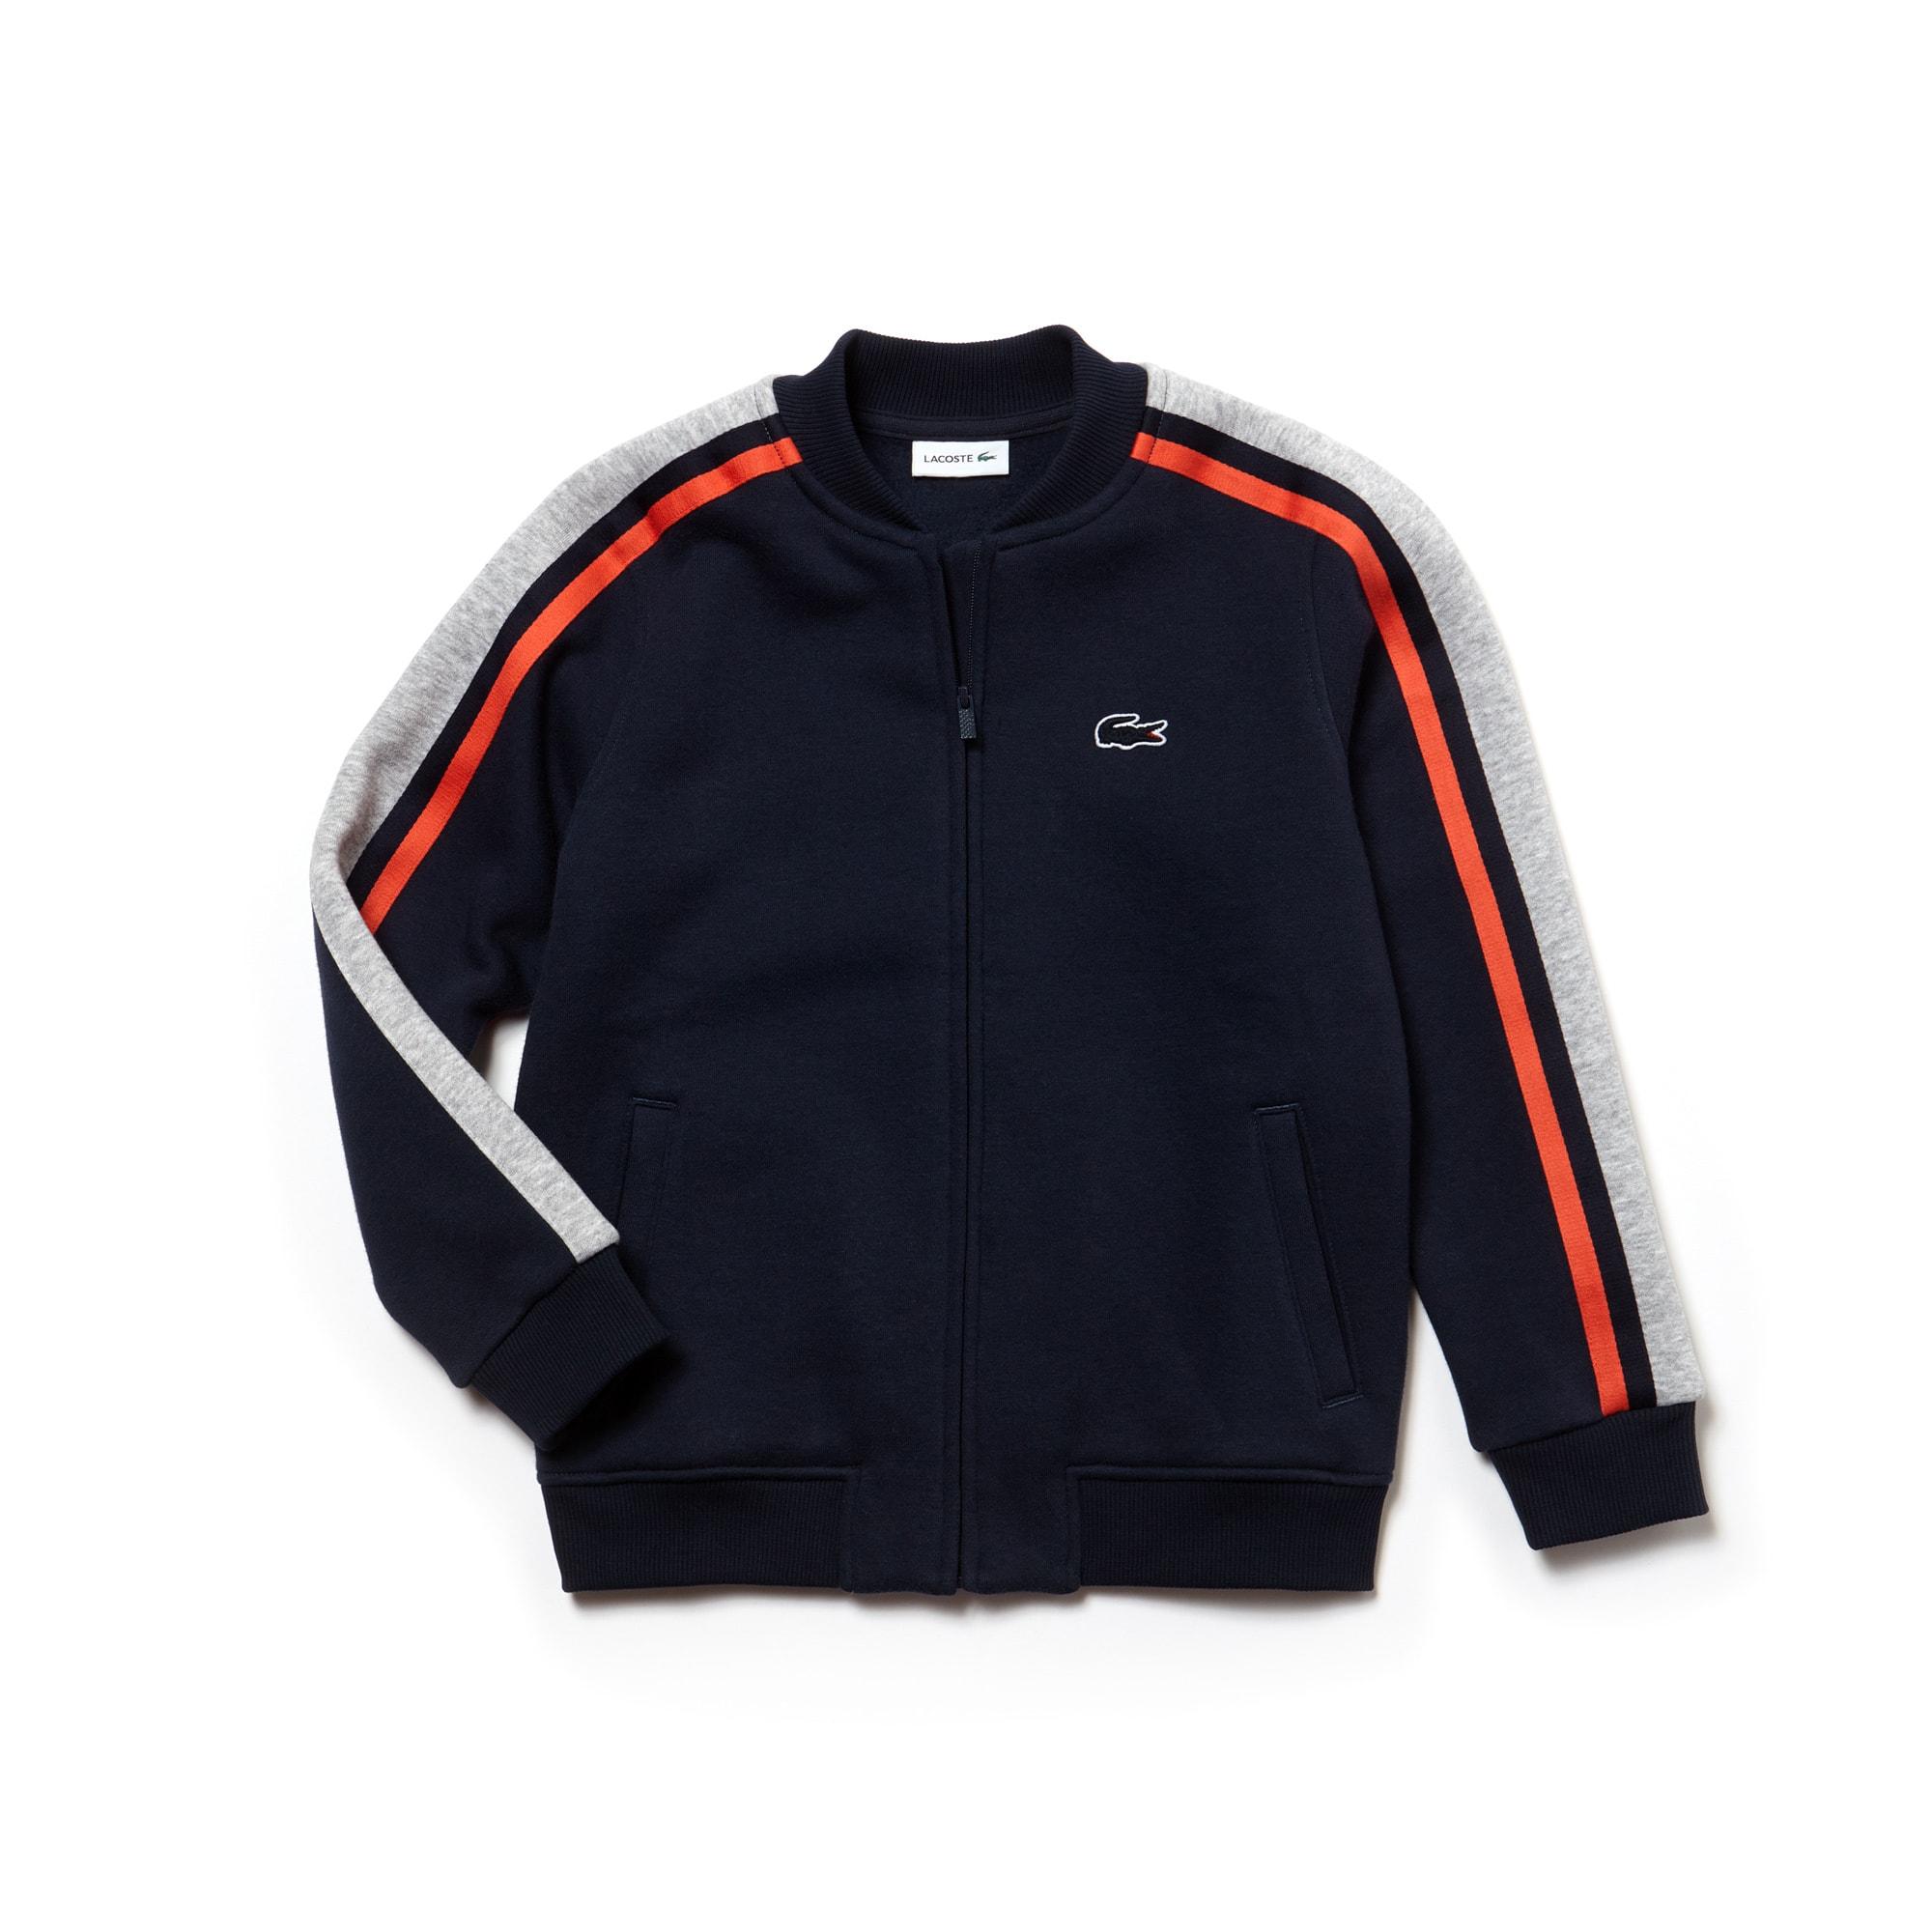 Sweatshirt Teddy Garçon en molleton avec rayures contrastées